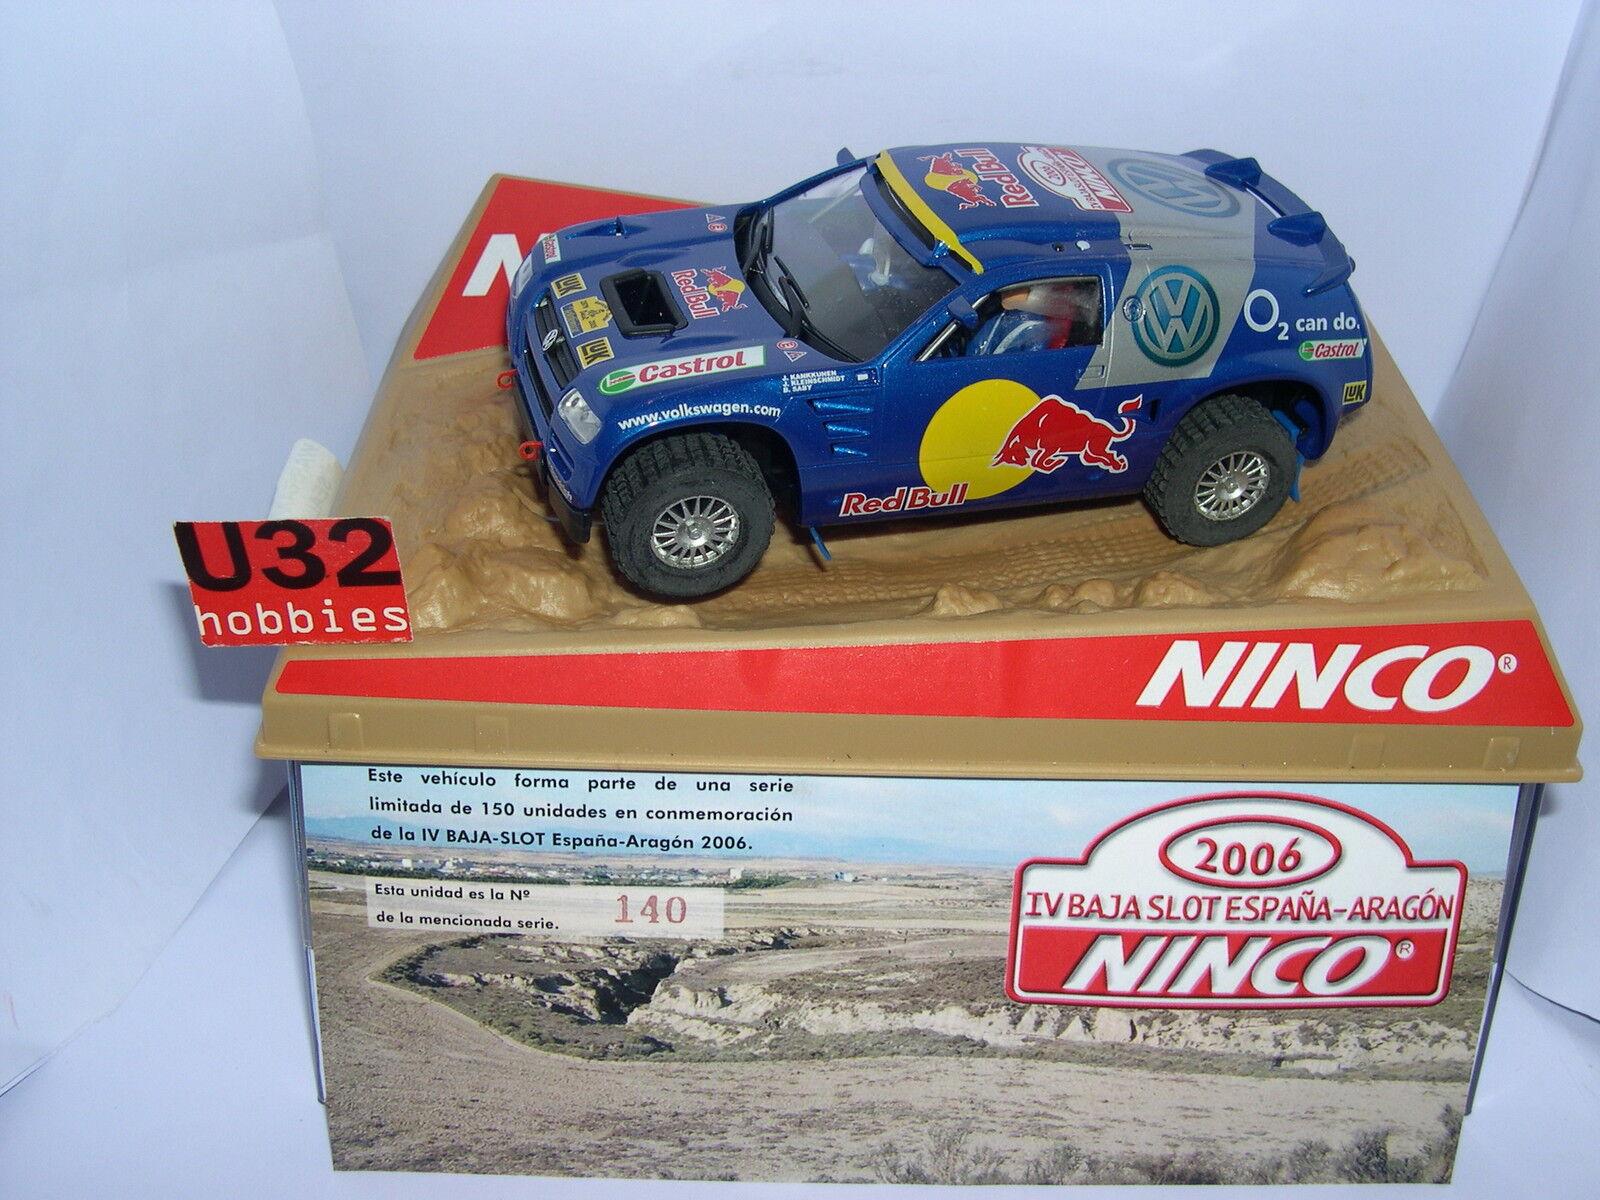 Ninco Voiture Touareg Vw Basse Slot Volkswagen 2006 150units Aragon H29eWEDIYb